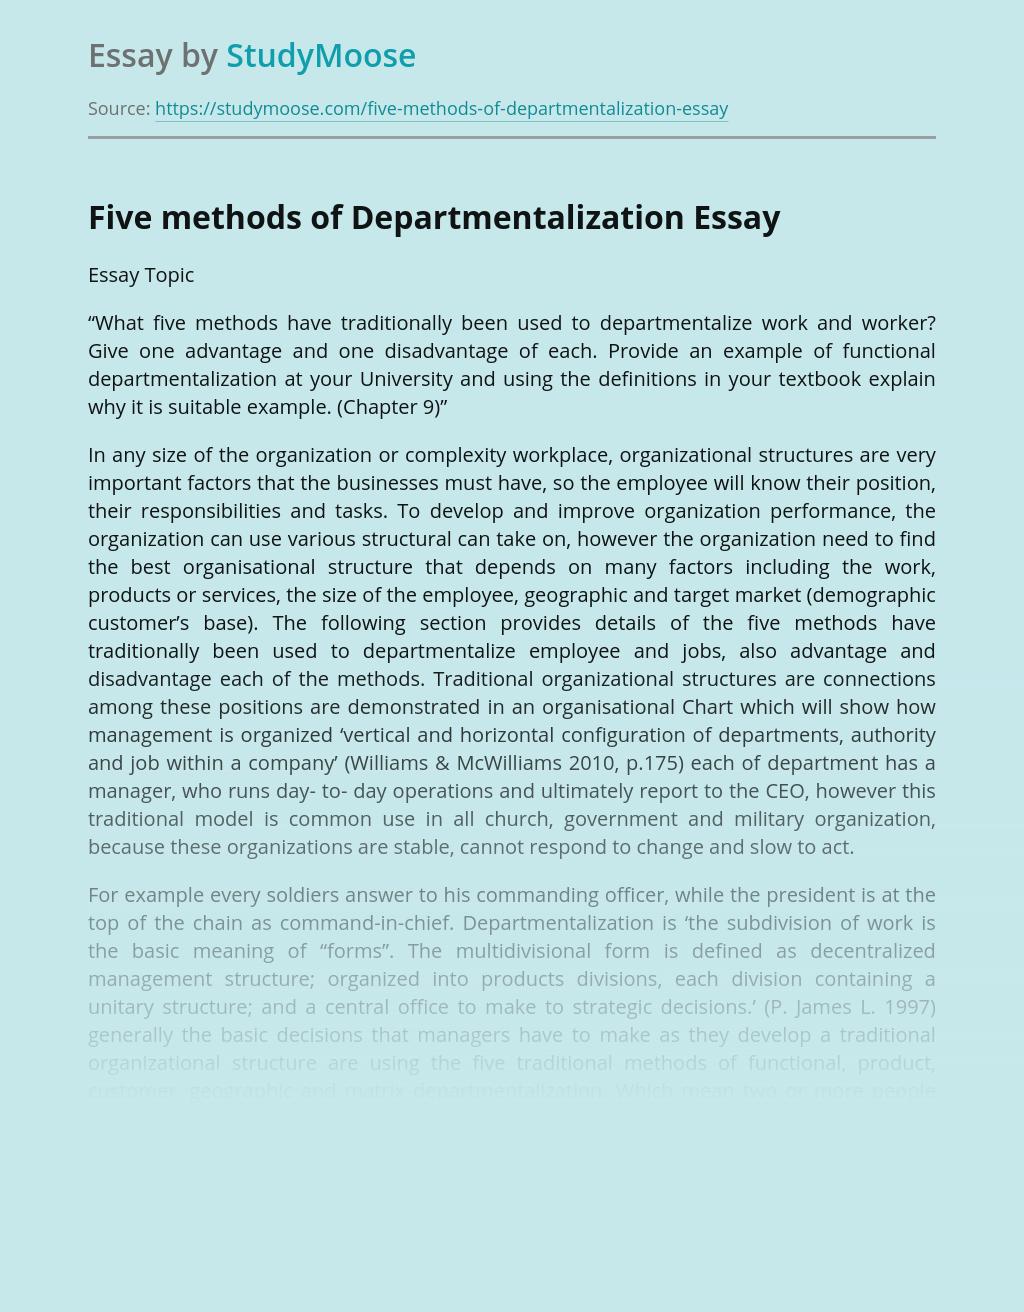 Five methods of Departmentalization in Management